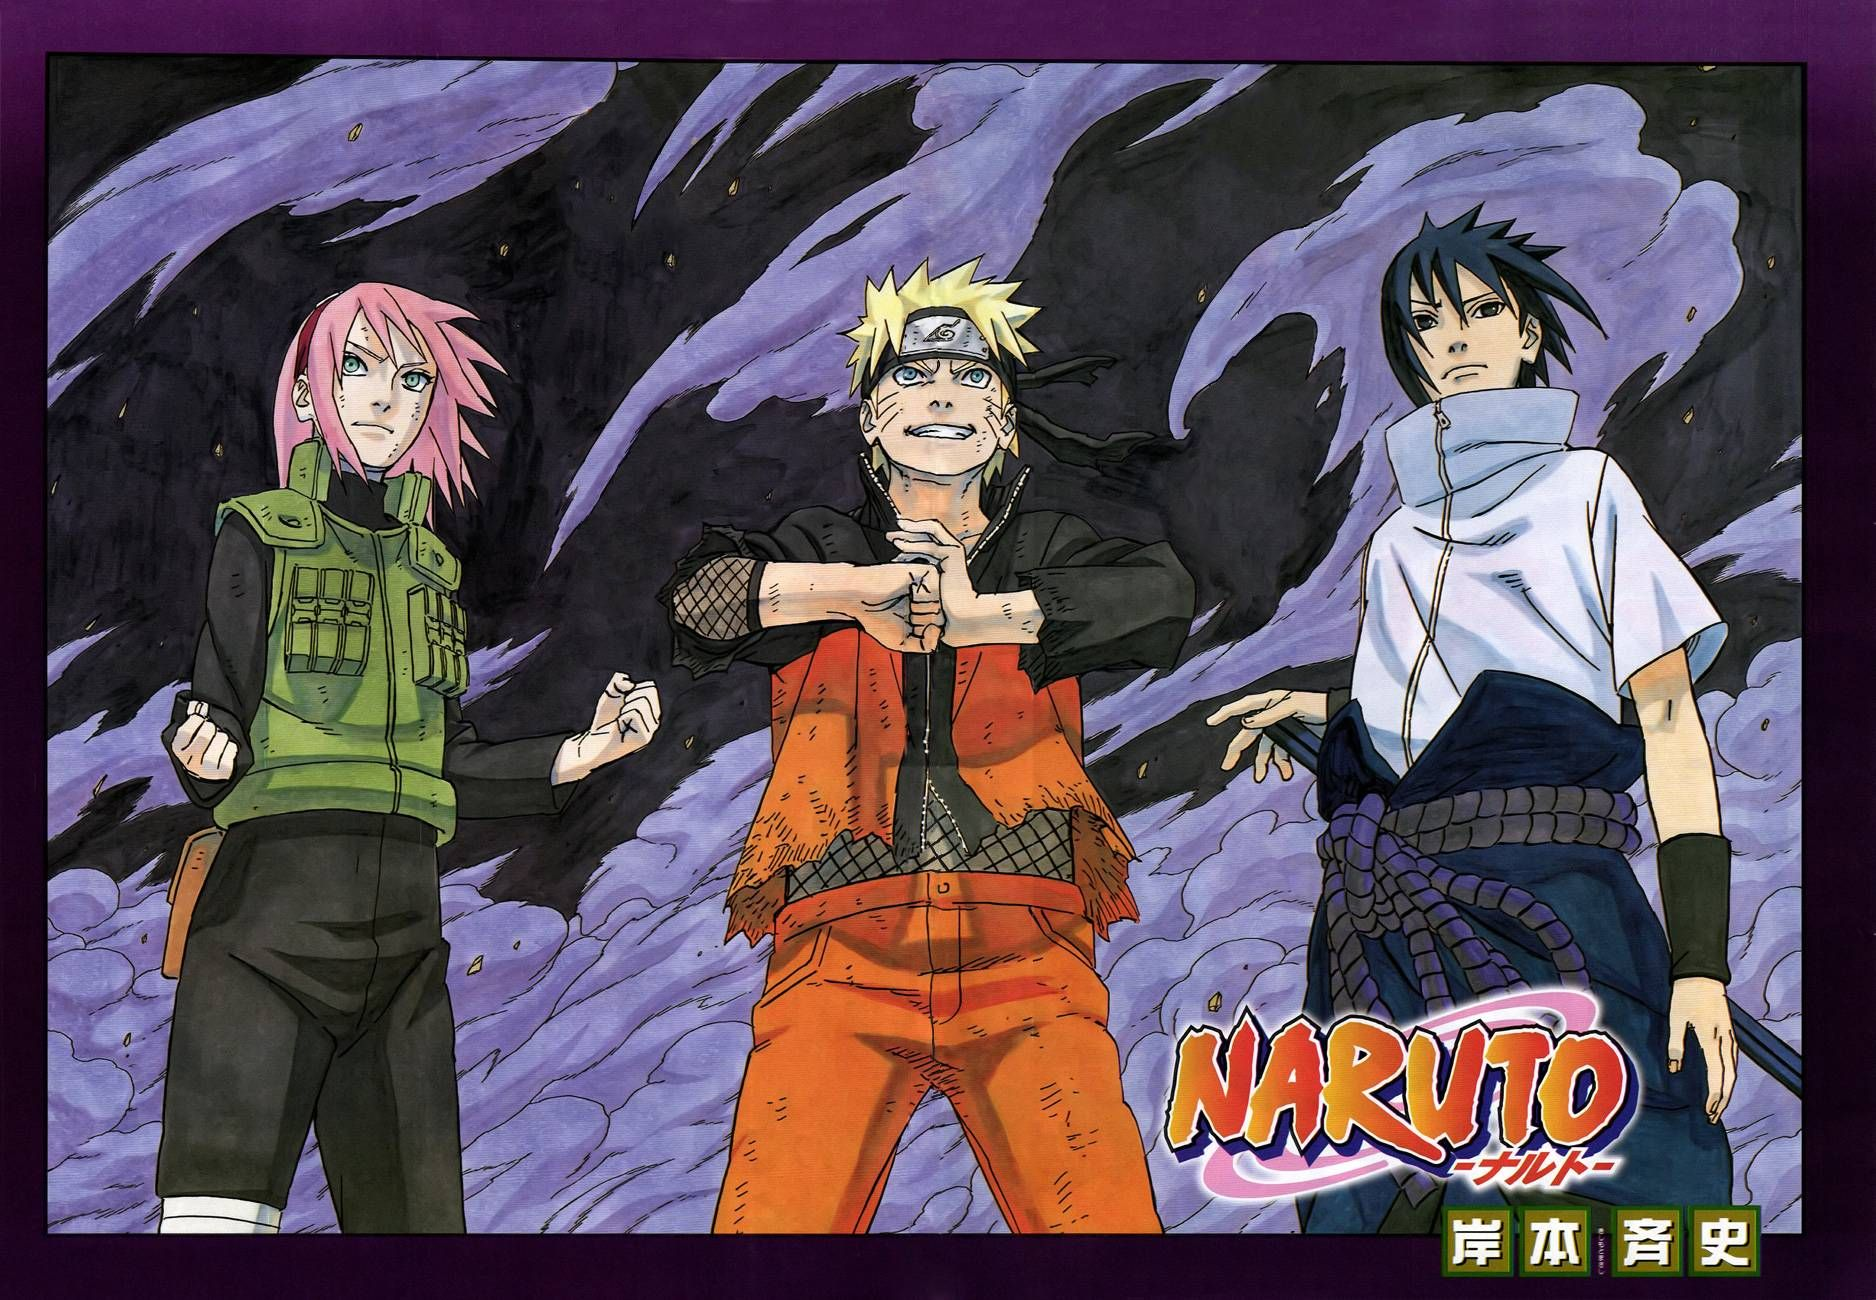 Good Wallpaper Naruto Team 7 - 59bc5825515a31e75e67500610d6147d  Picture.jpg